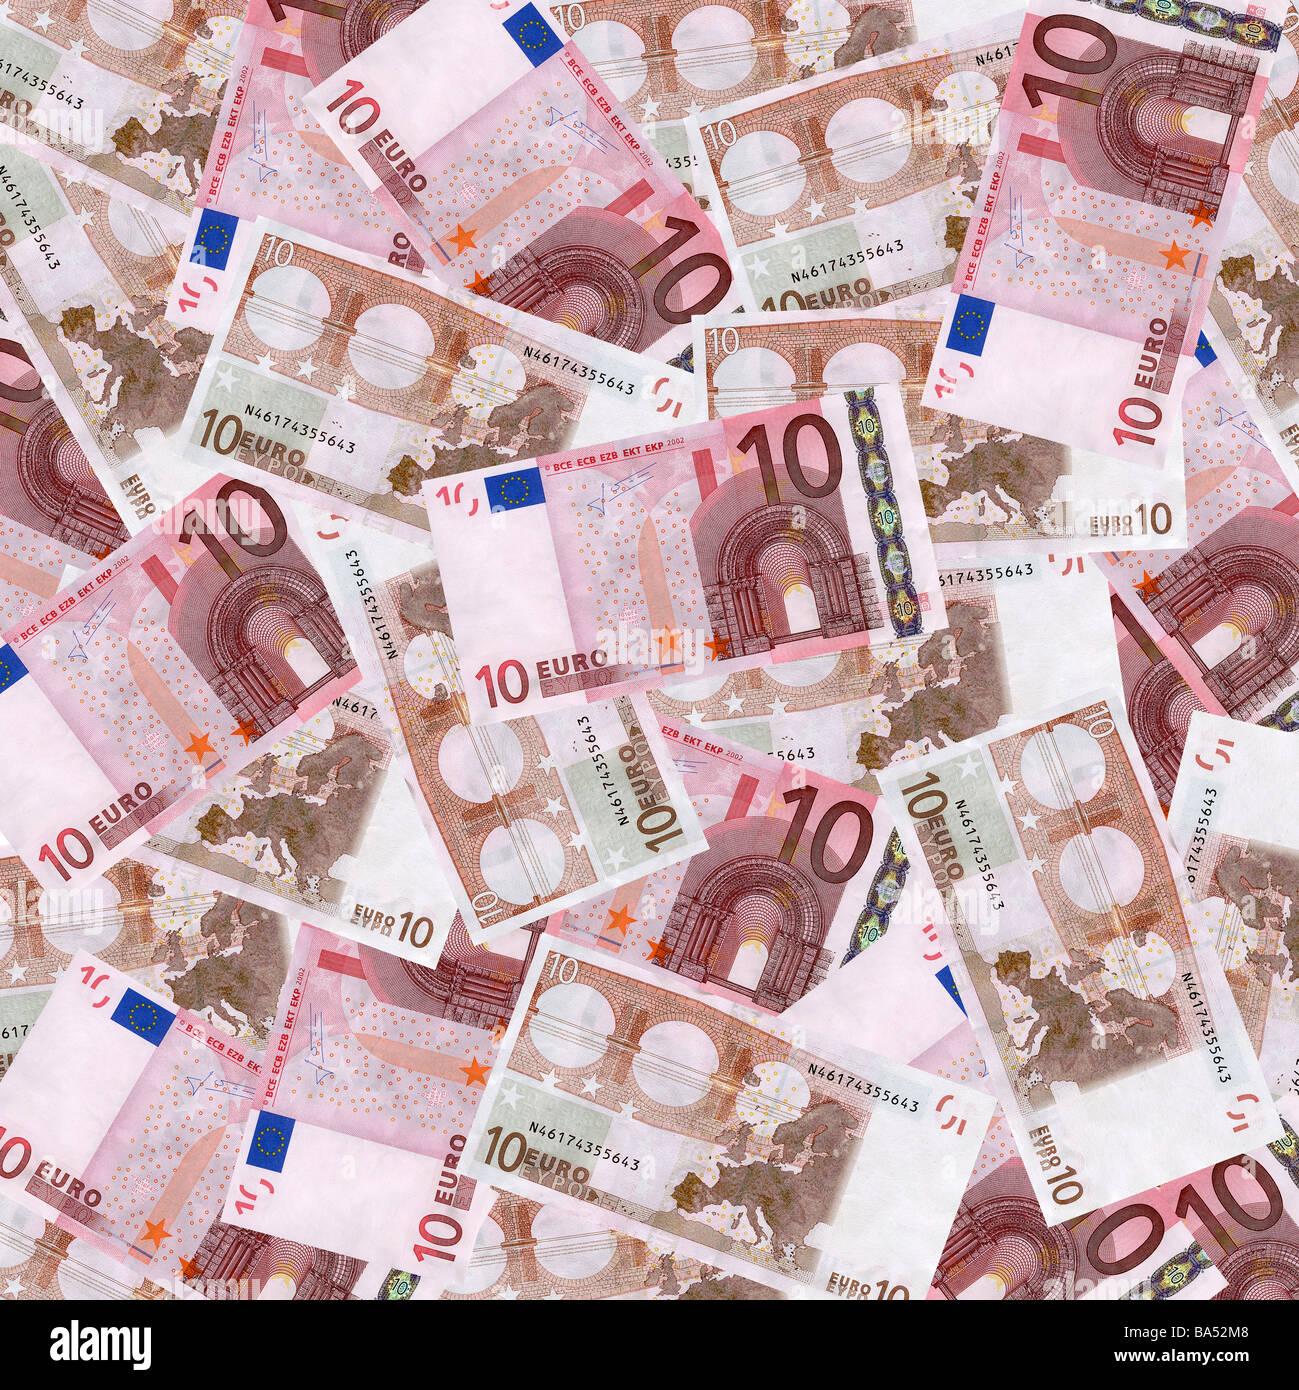 European ten euro notes overhead view - Stock Image